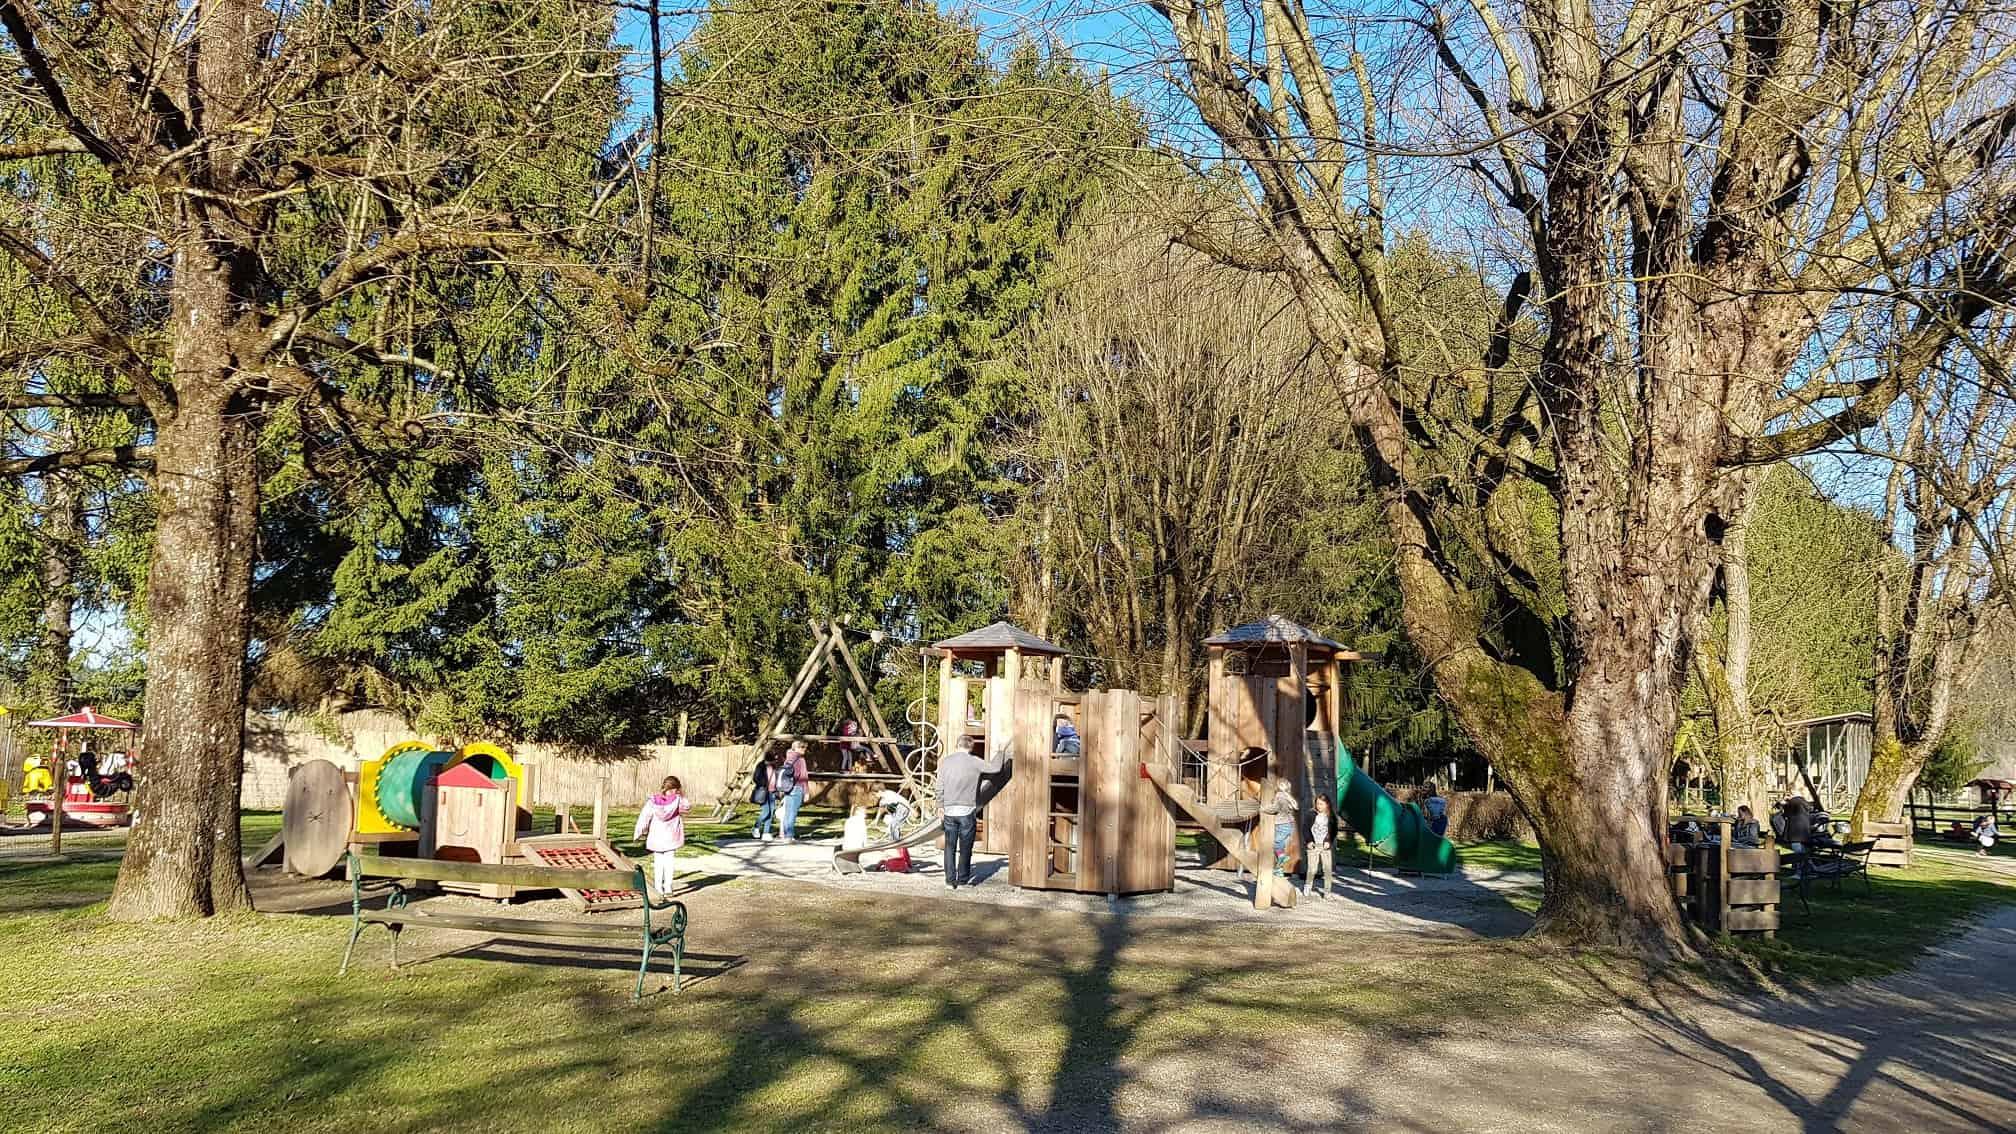 Familienausflug Frühling Kinderspielplatz Tierpark Rosegg Kärnten